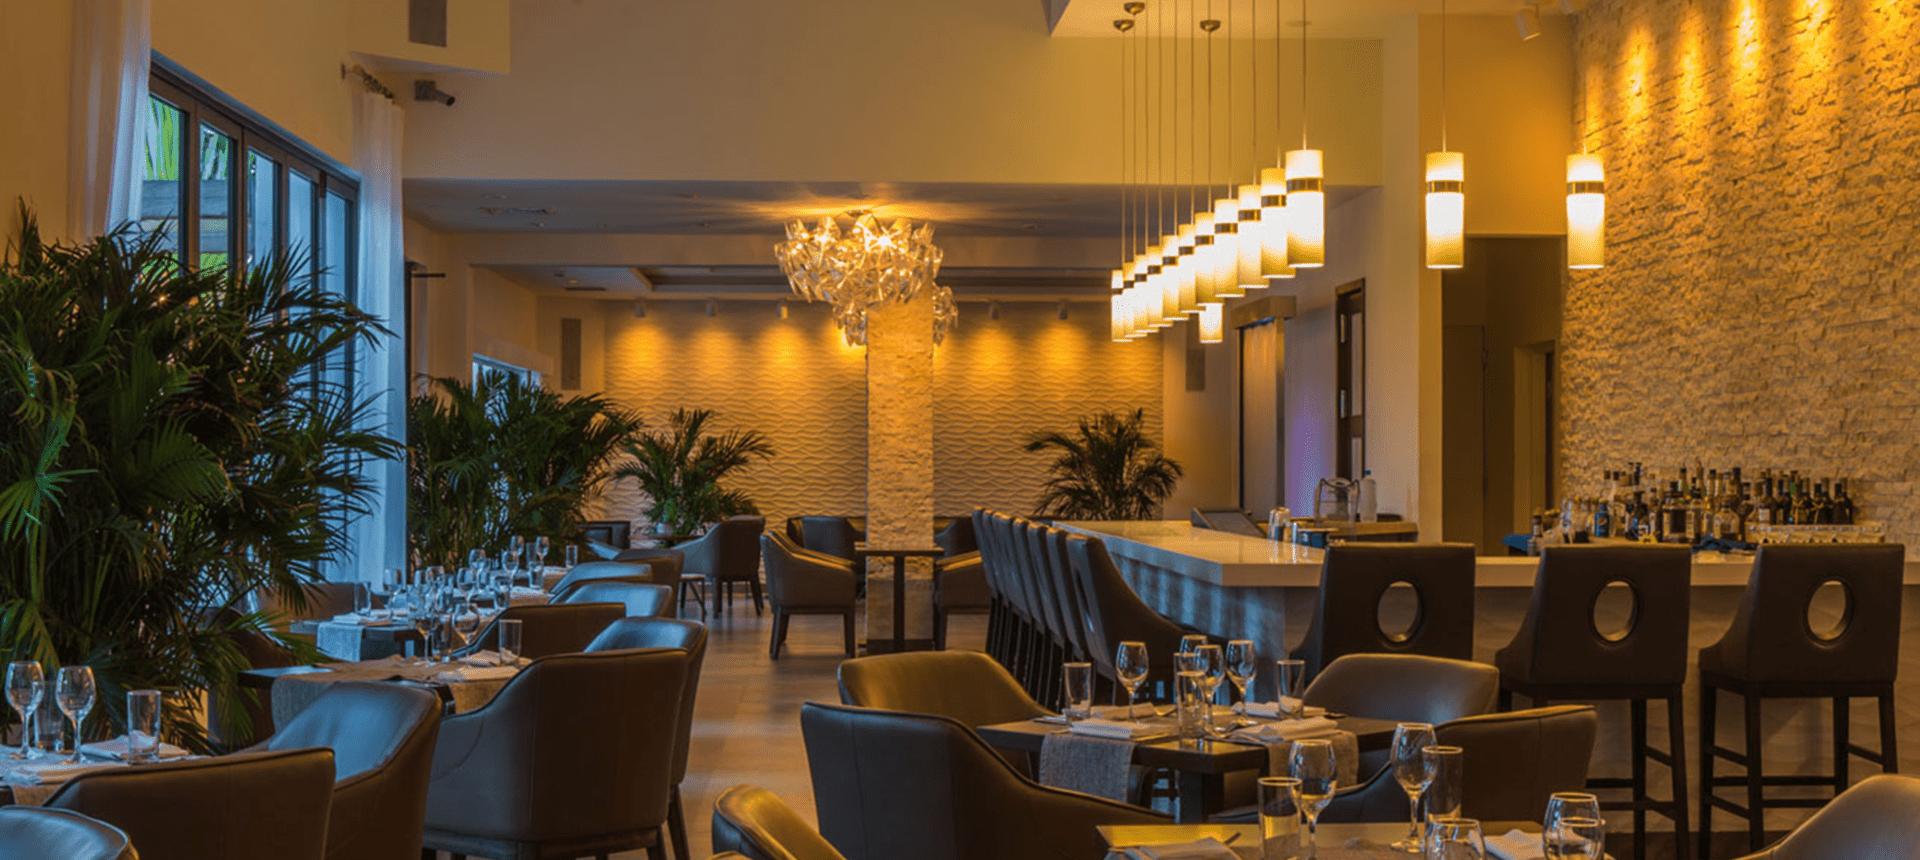 Empty hotel bar with warm lighting